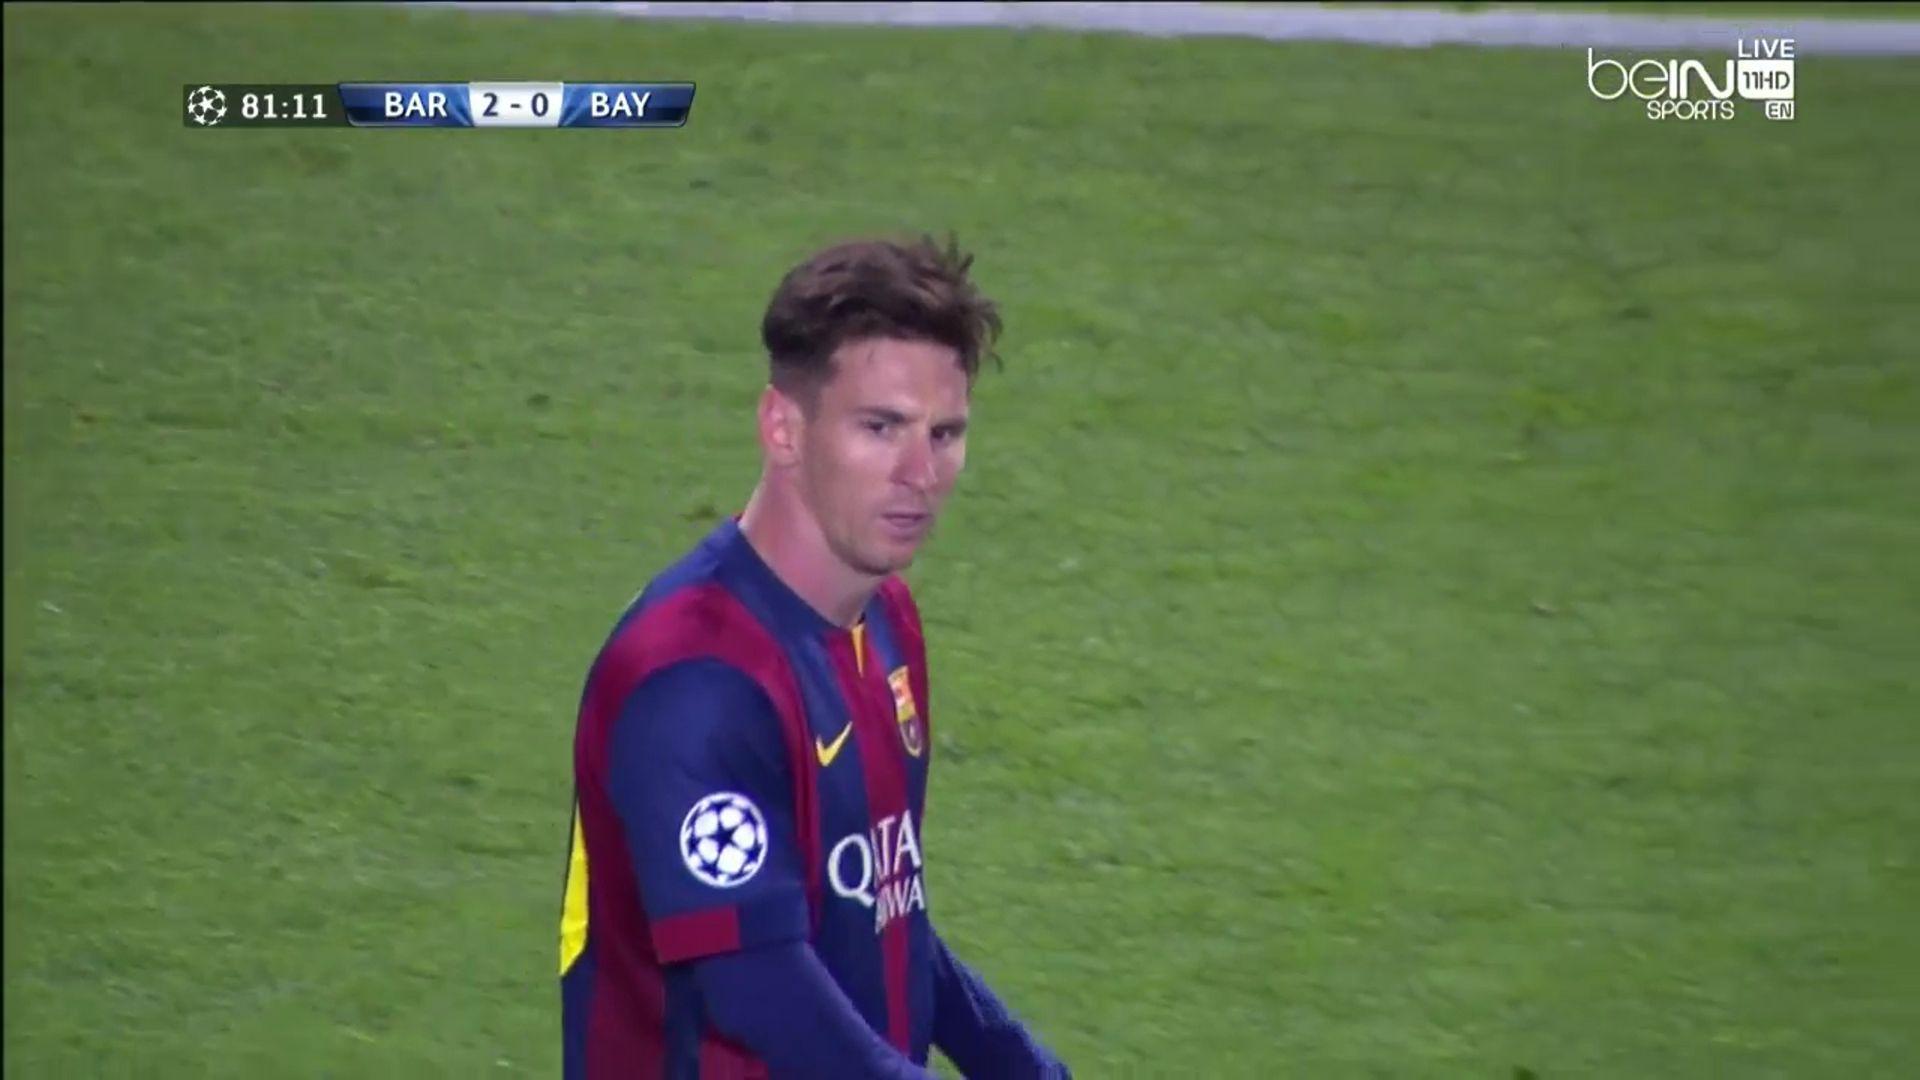 Lionel Messi V Bayern Munich 5 06 15 Lionel Messi Bayern Munich Bayern